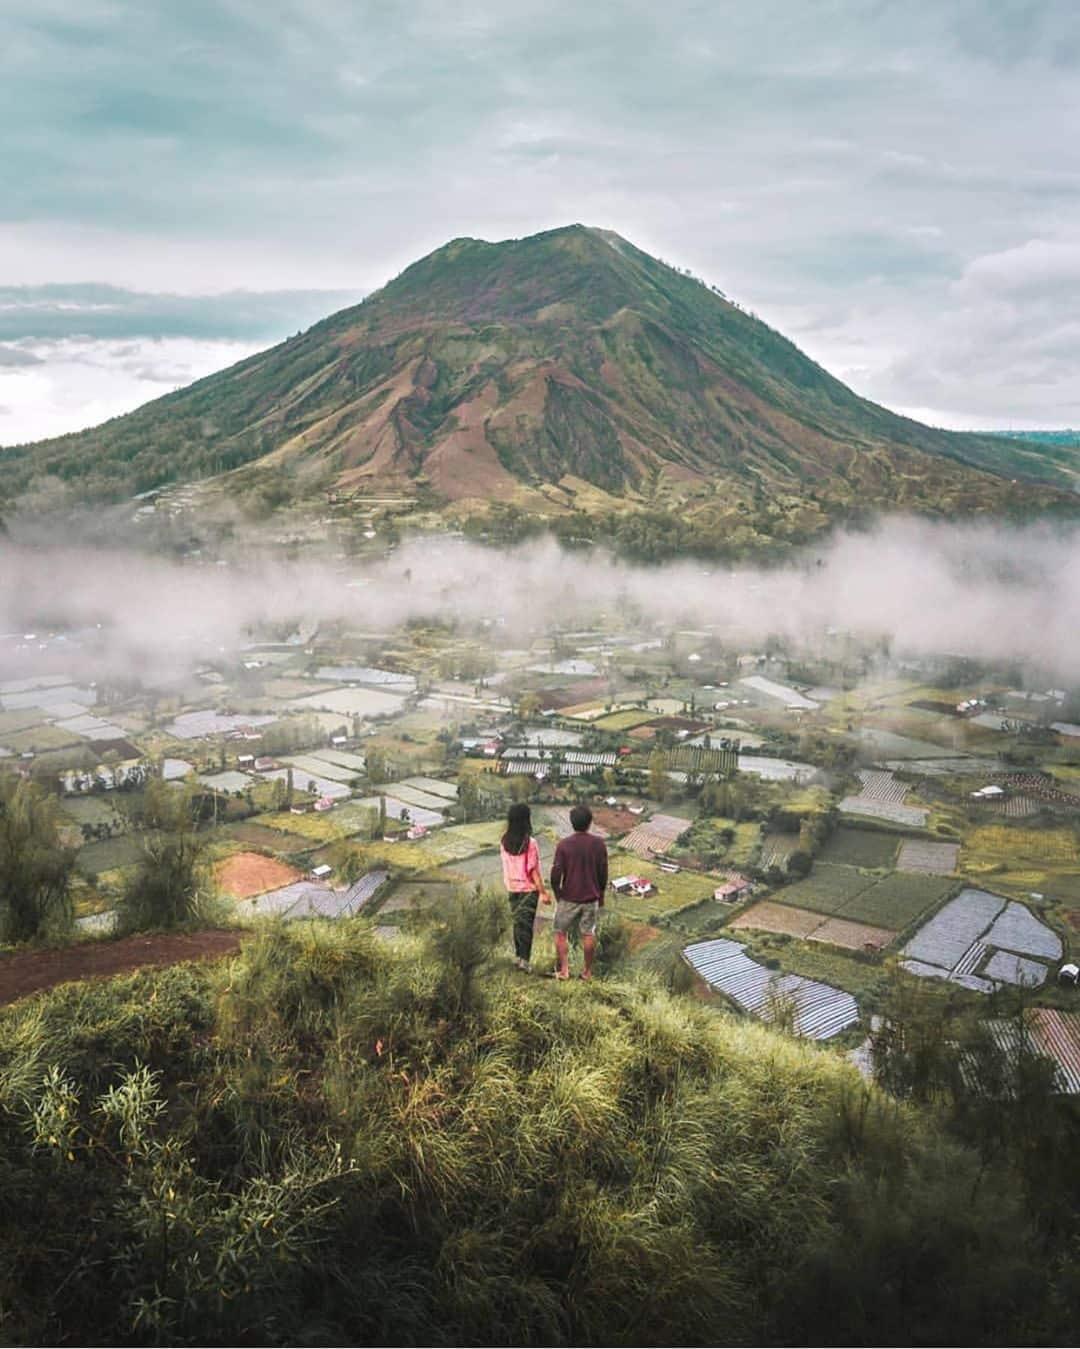 Desa Pinggan Overview